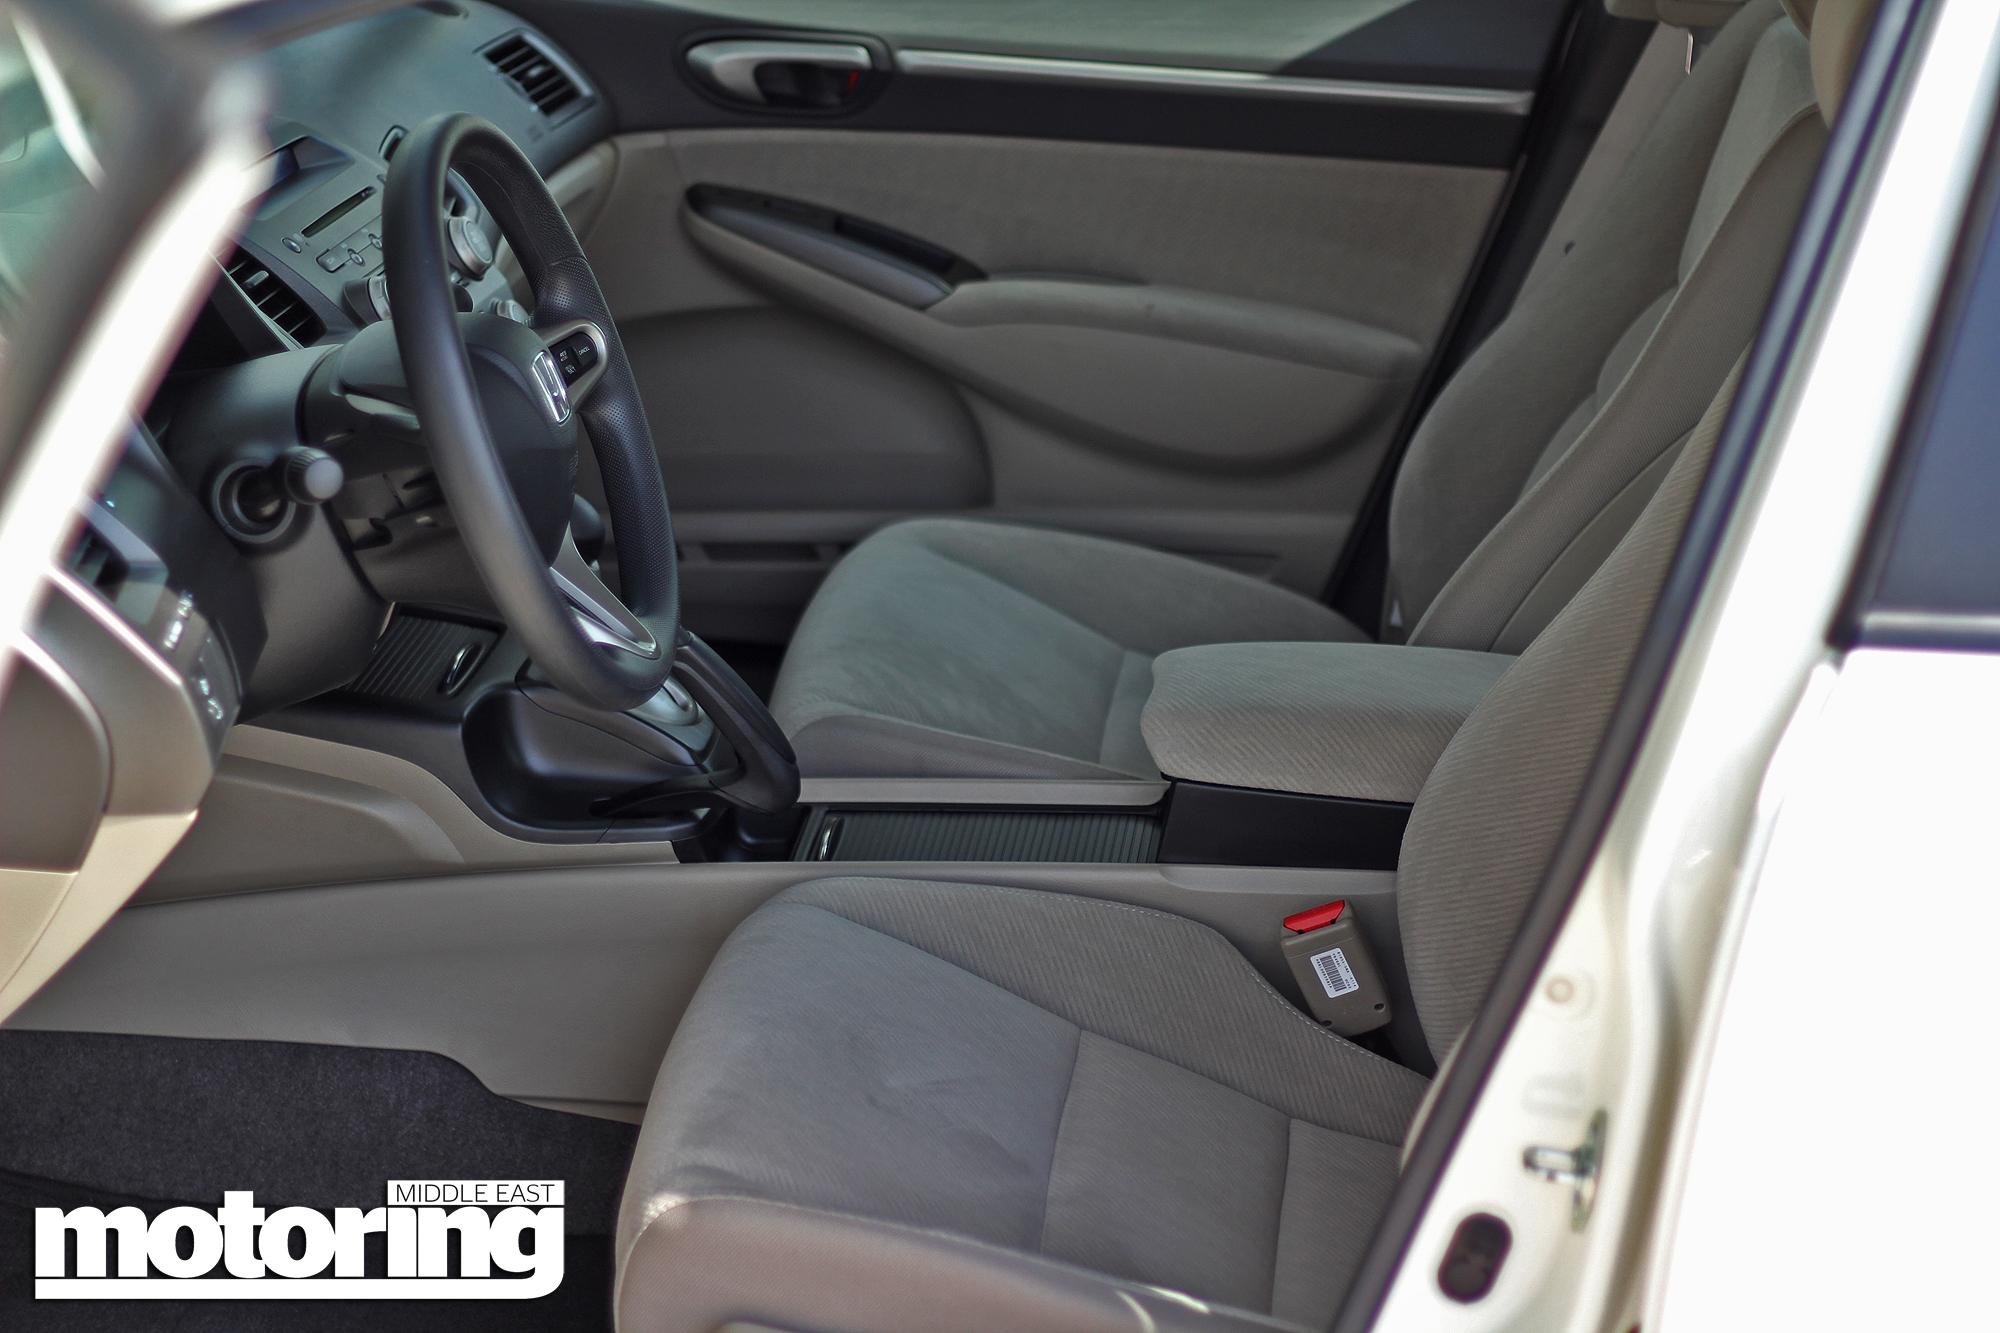 Used Buying Guide Honda Civic 2006-2011 Model YearsMotoring